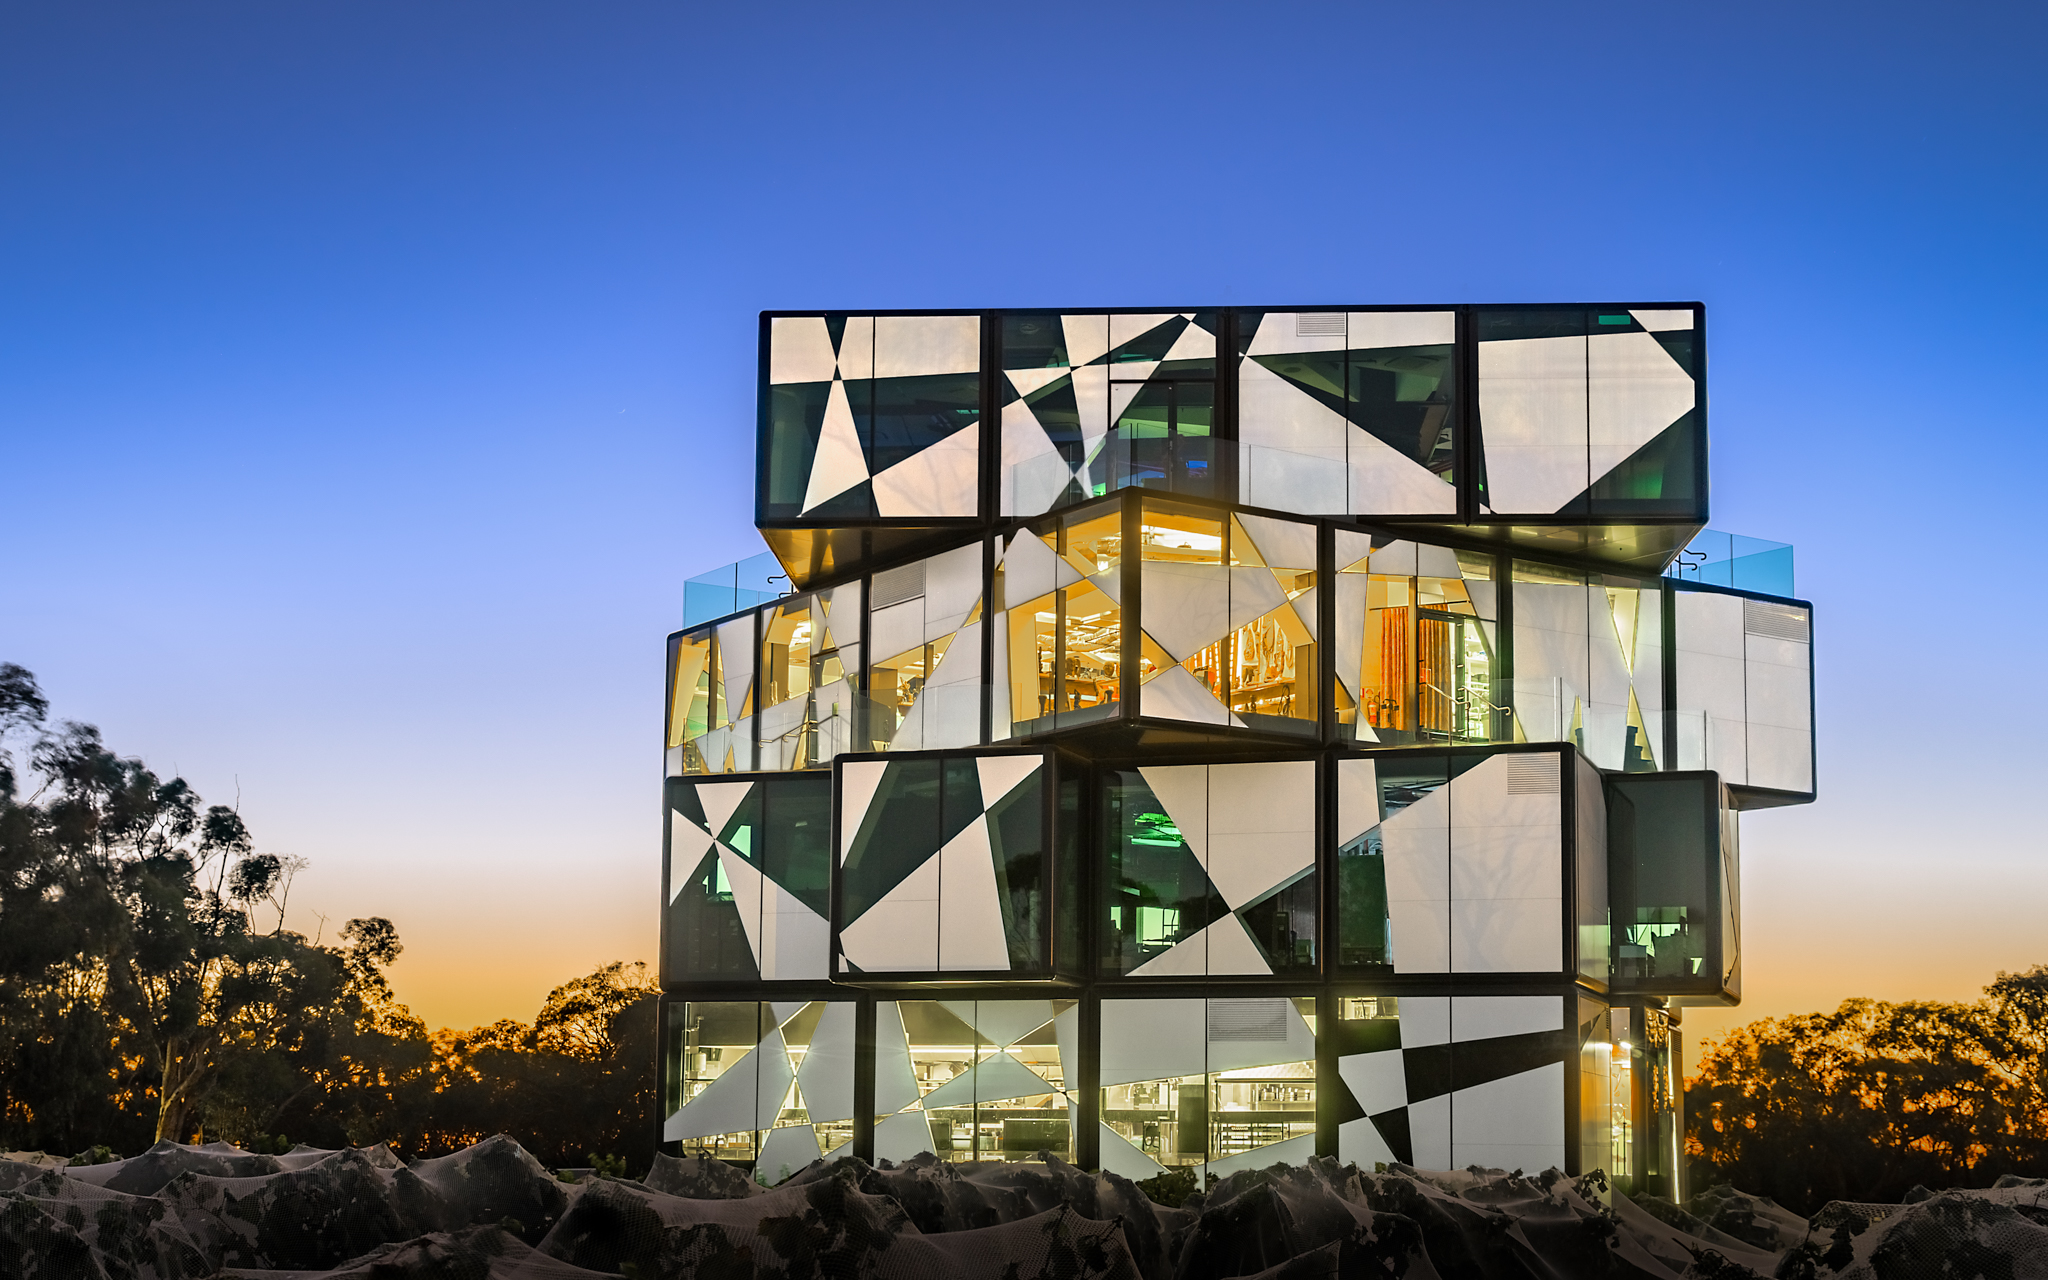 d'Arenberg Cube, Australia